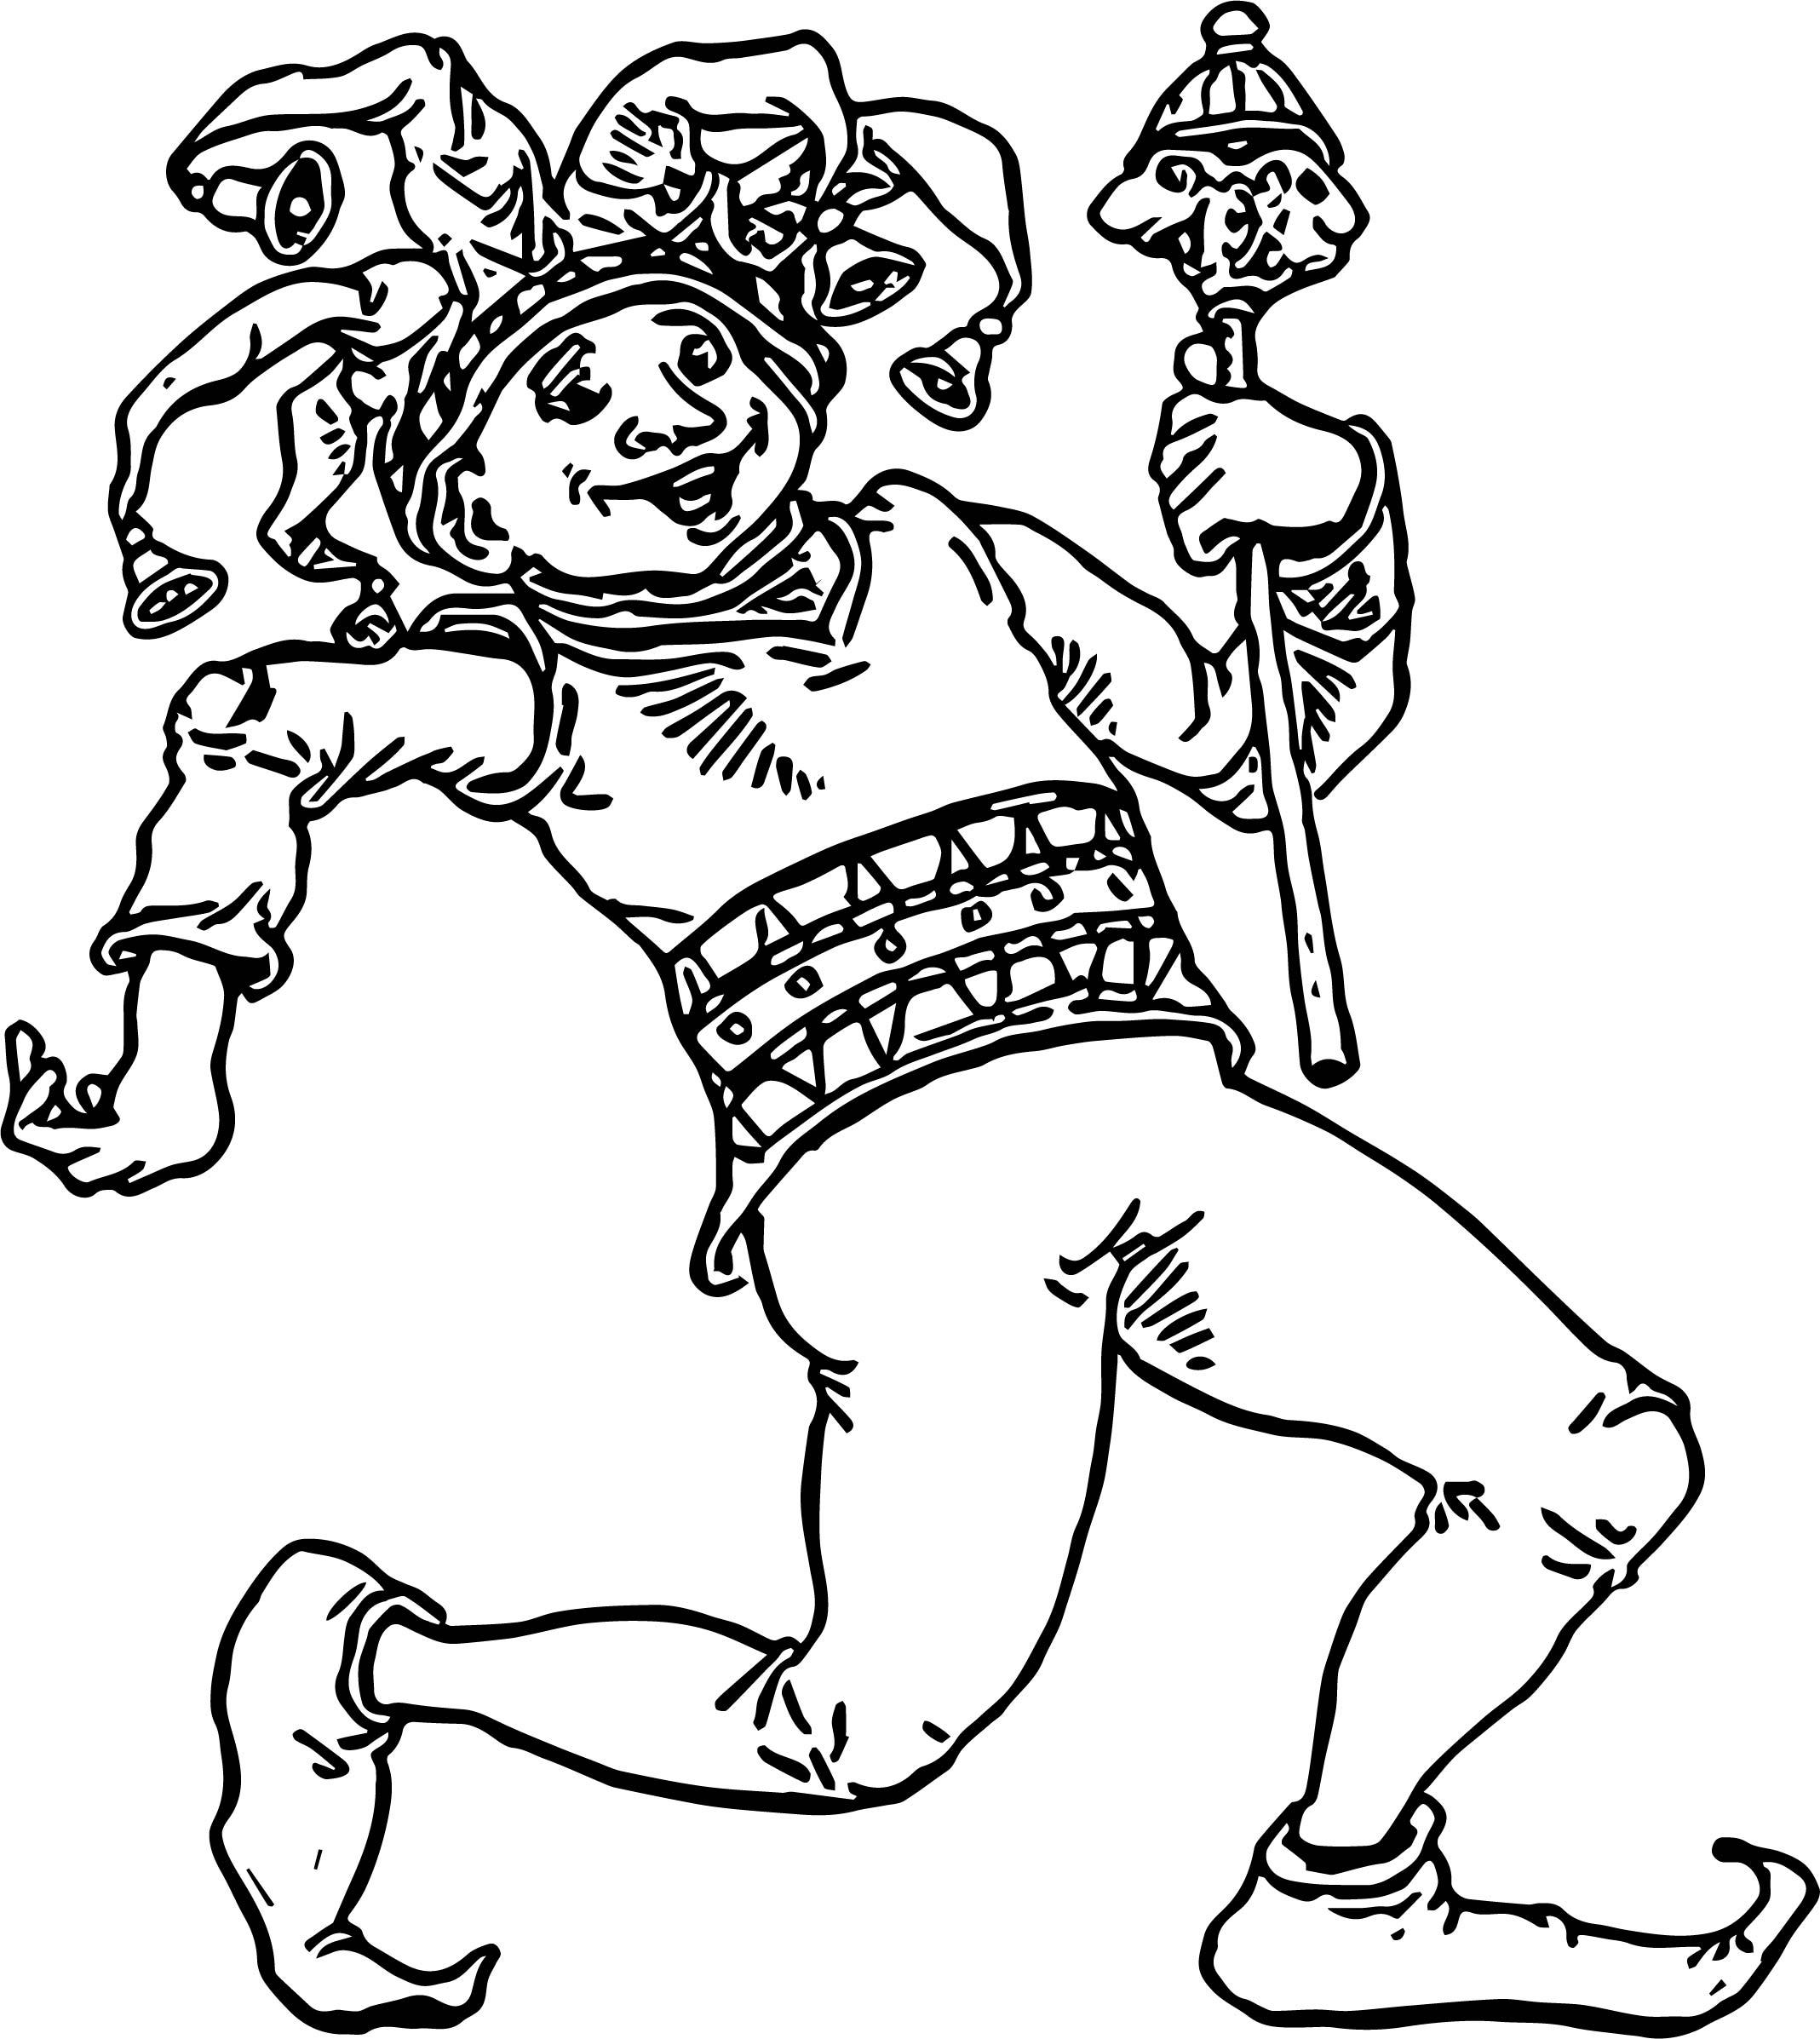 April Fool Man Walking Coloring Page